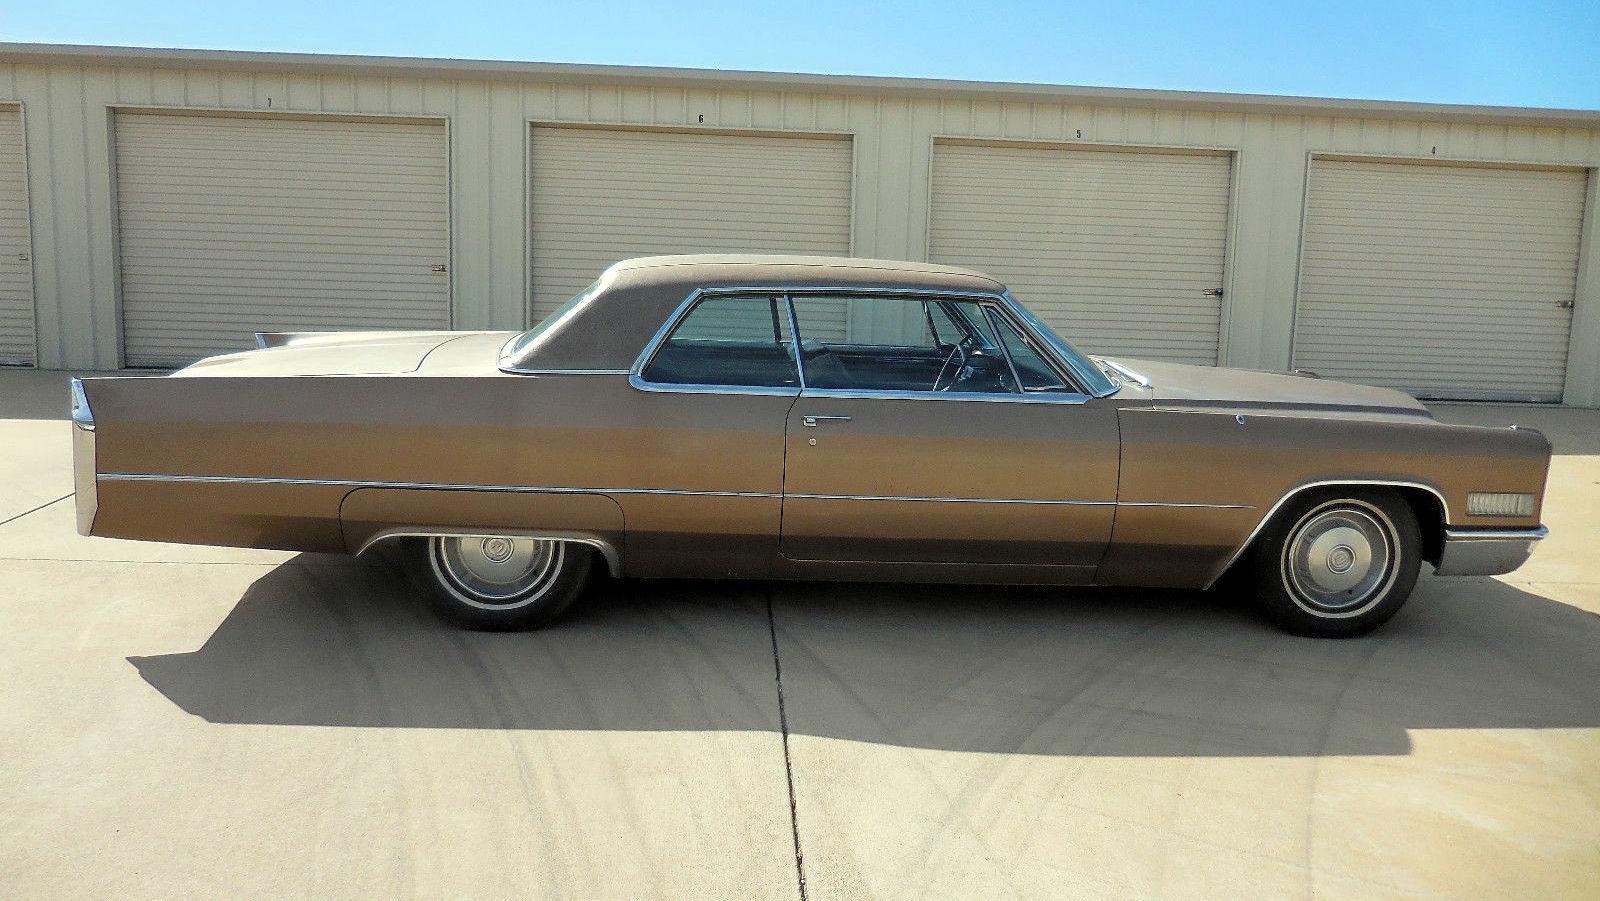 Black Plate : 1966 Cadillac Coupe DeVille